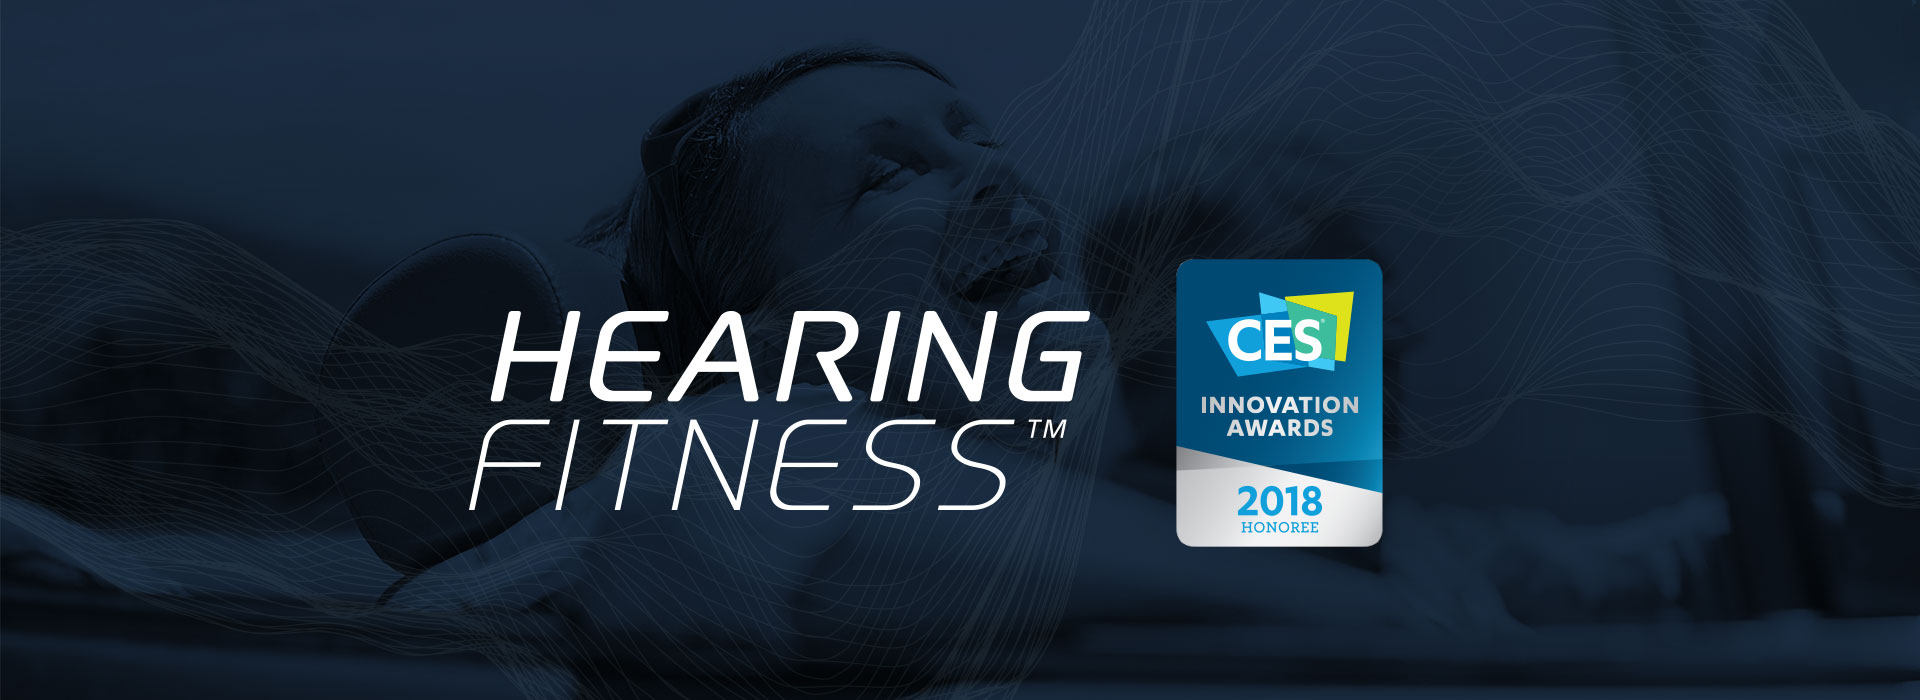 hearing fitness